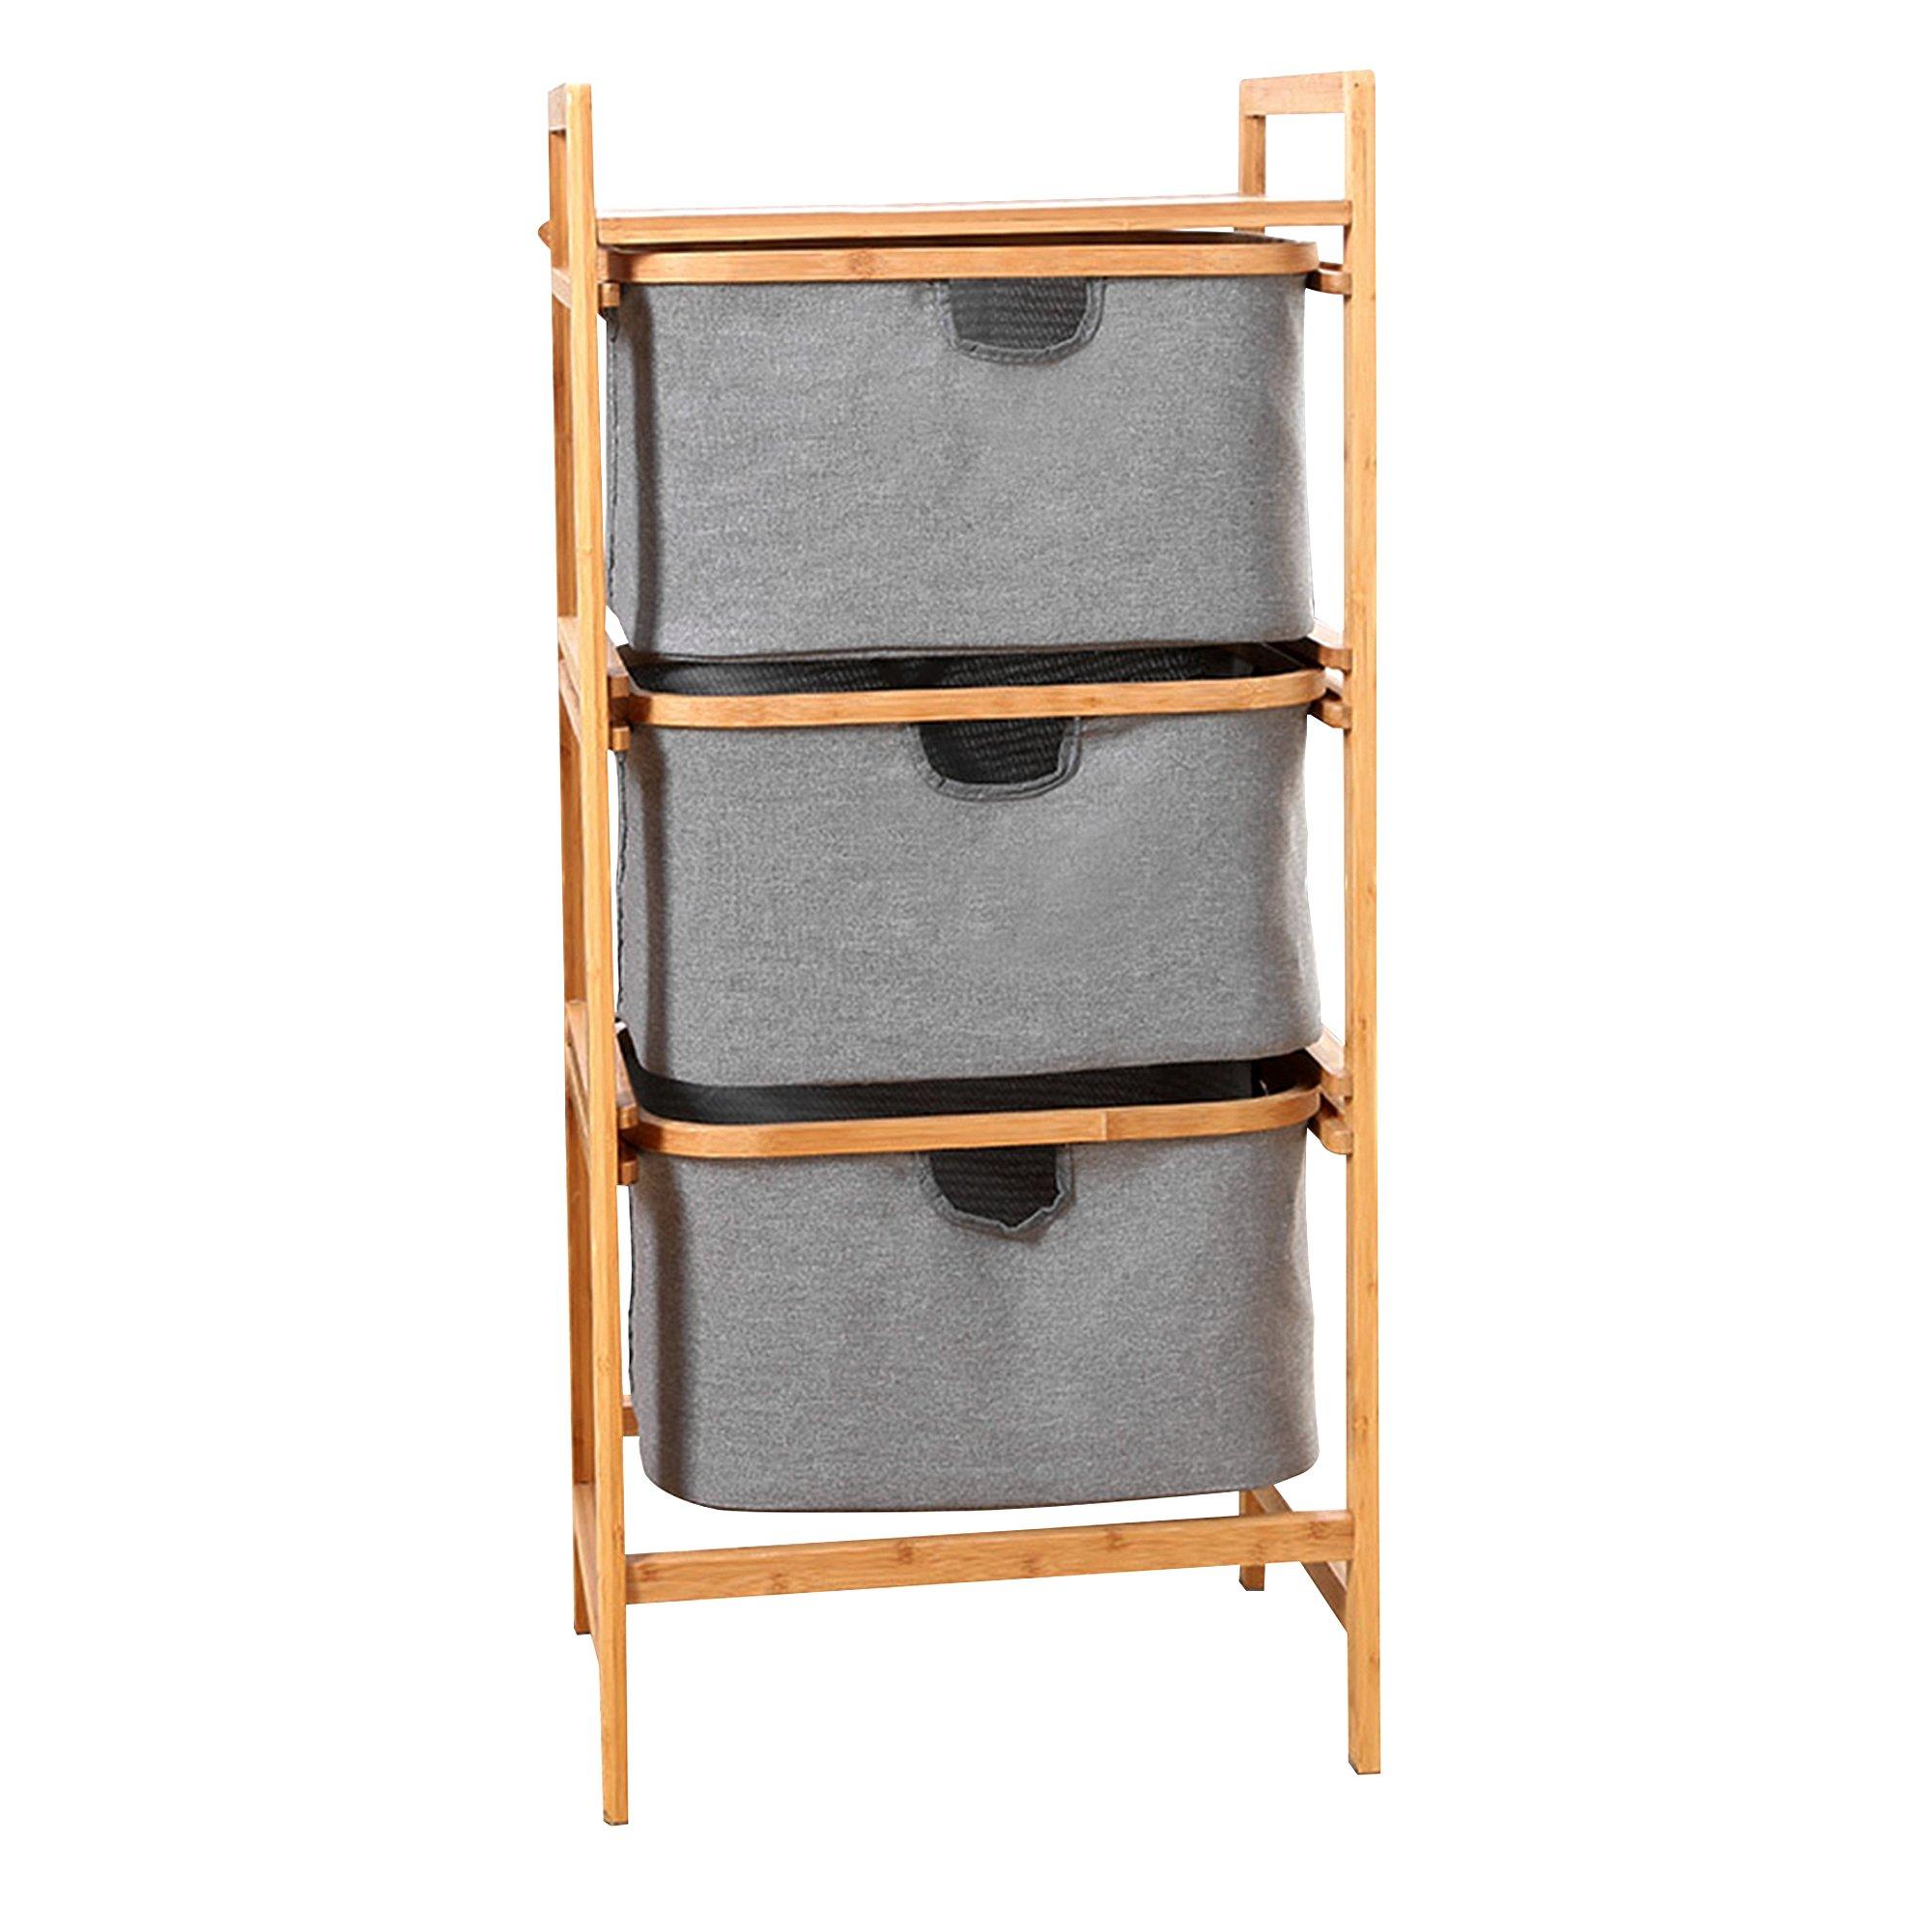 Bamboo Dresser Storage Unit with Sliding Drawers